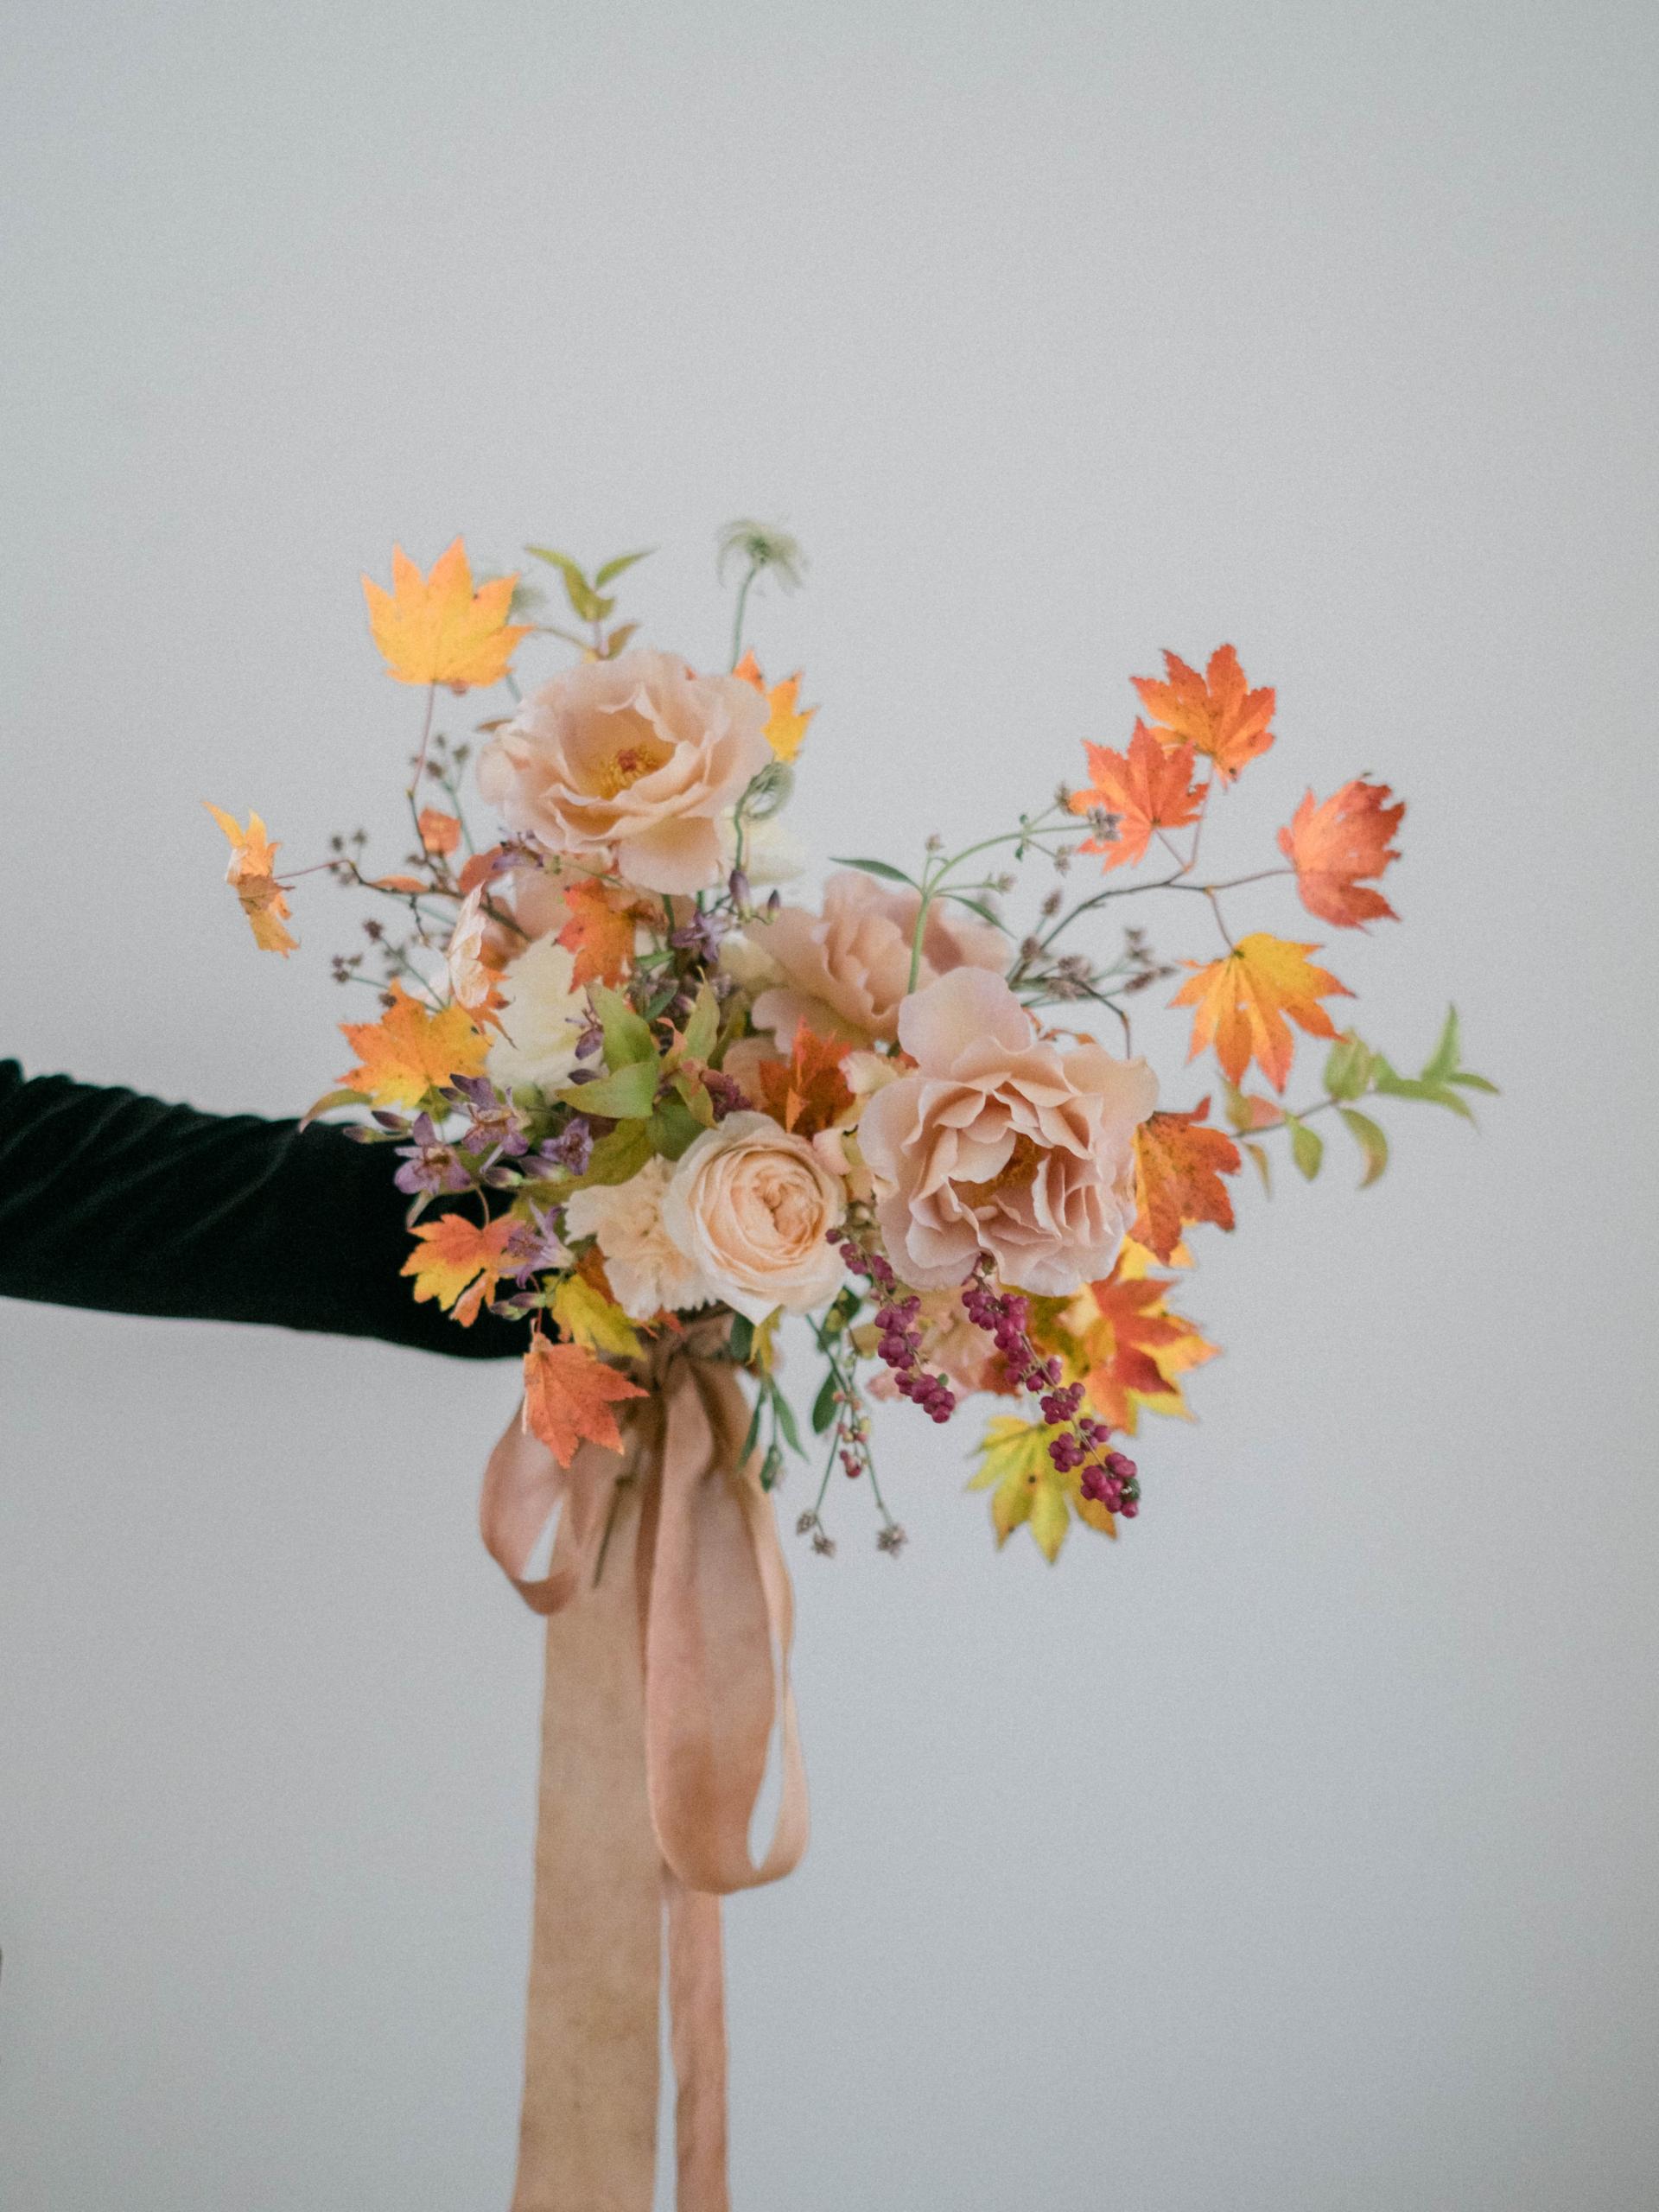 Autumnal bridal bouquet 秋のウェディングブーケ